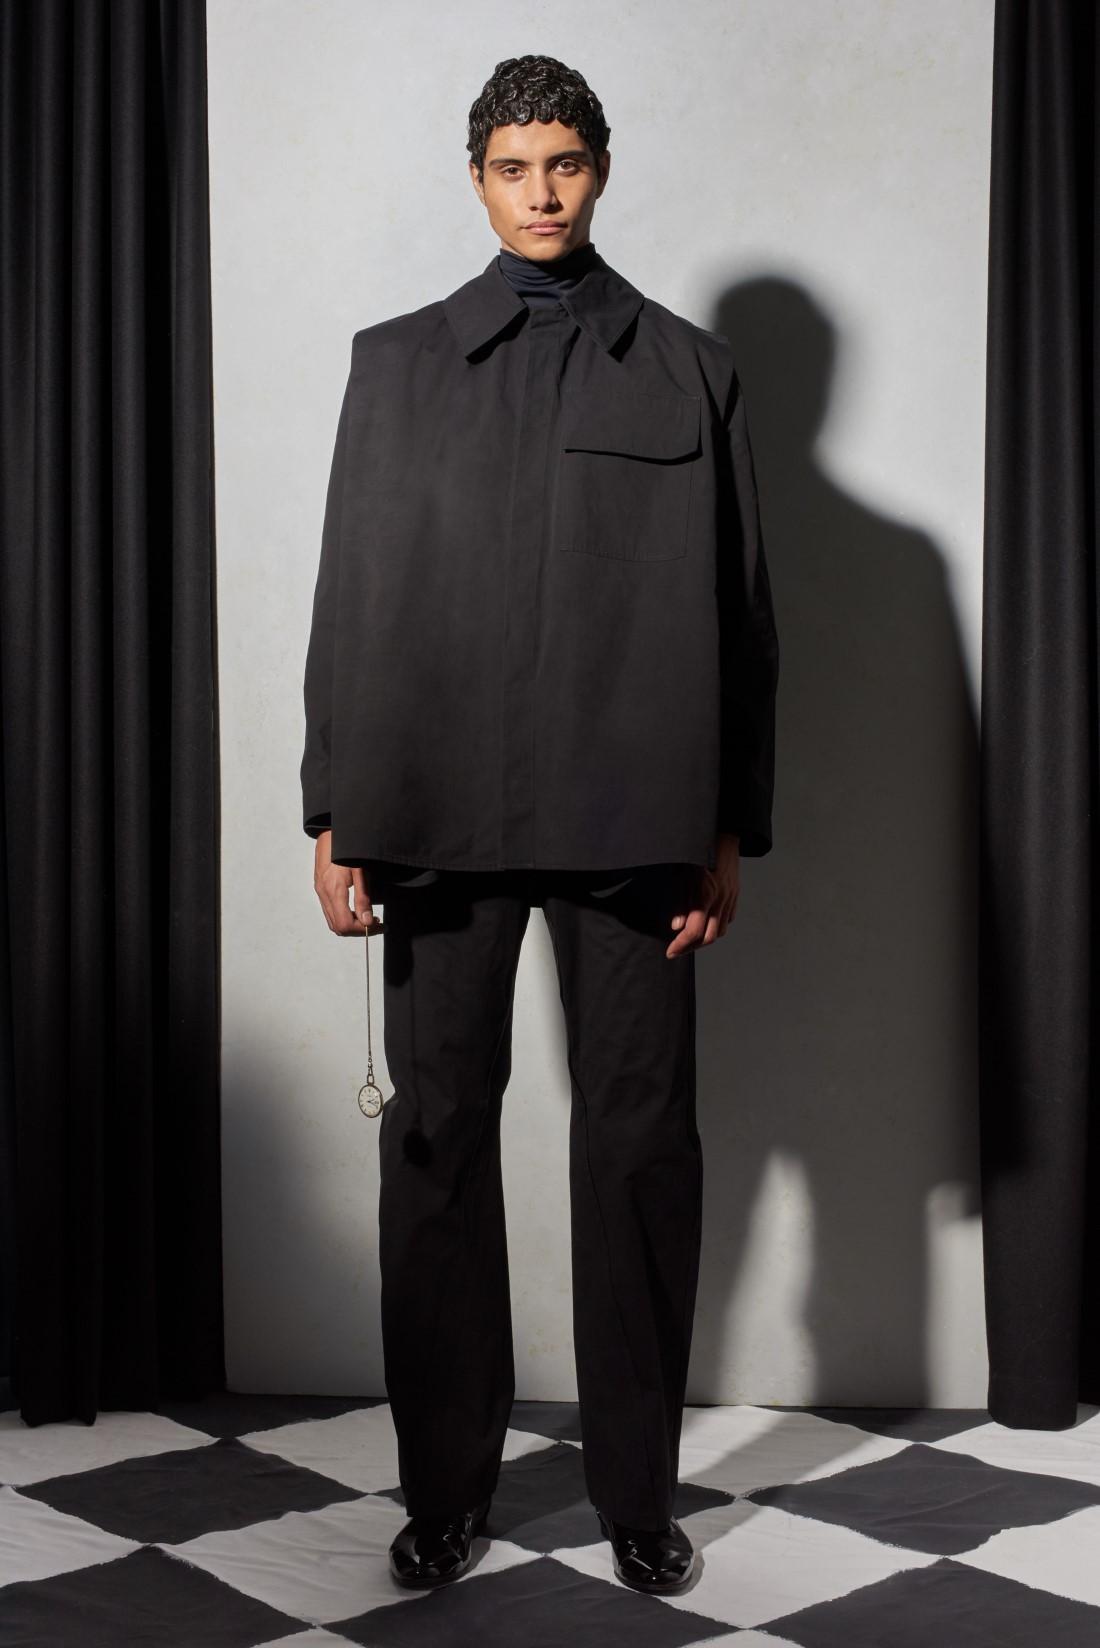 Bianca Saunders - Automne-Hiver 2021-2022 - London Fashion Week